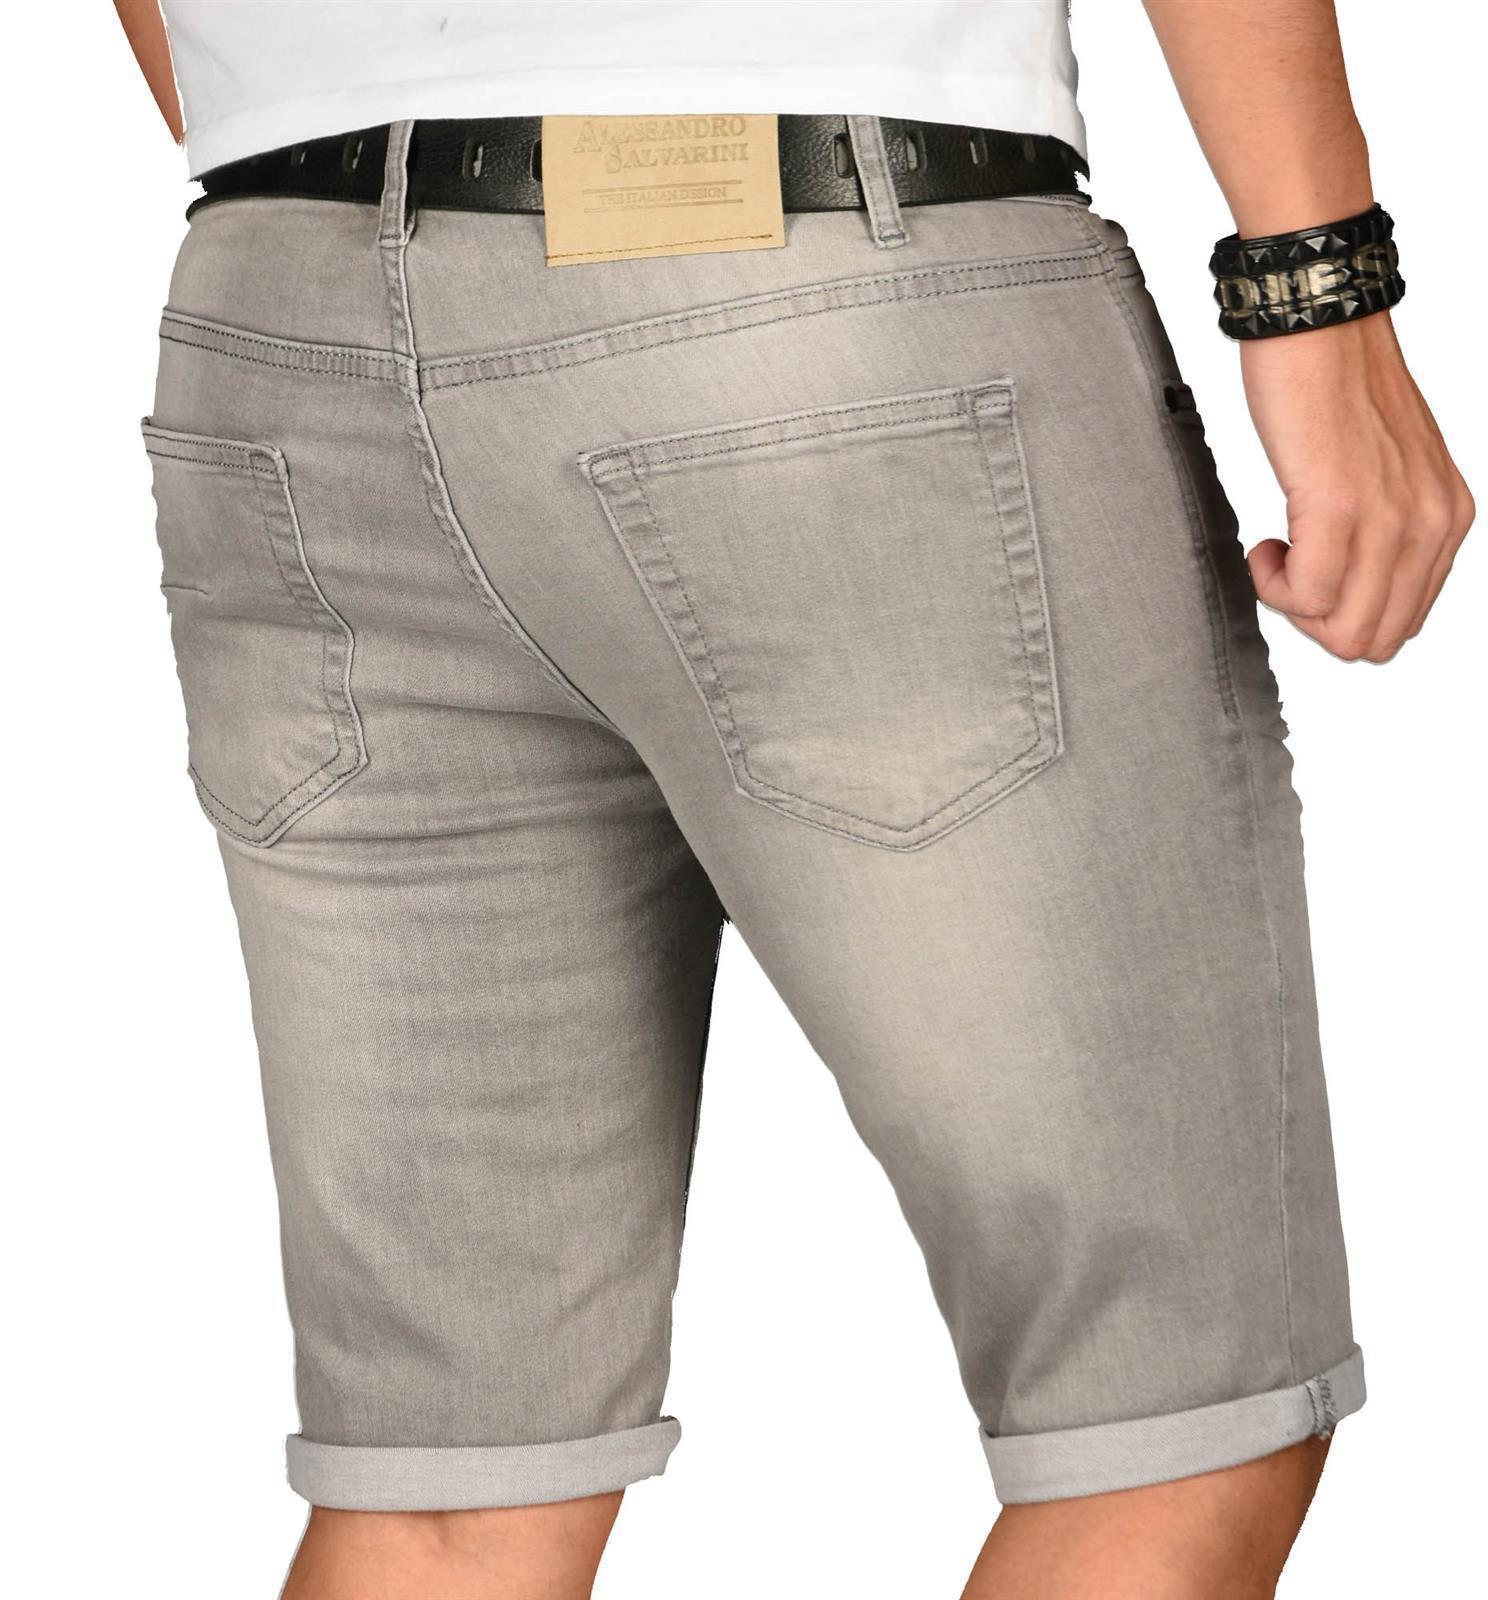 A-Salvarini-Herren-Designer-Jeans-Short-kurze-Hose-Slim-Sommer-Shorts-Washed Indexbild 40